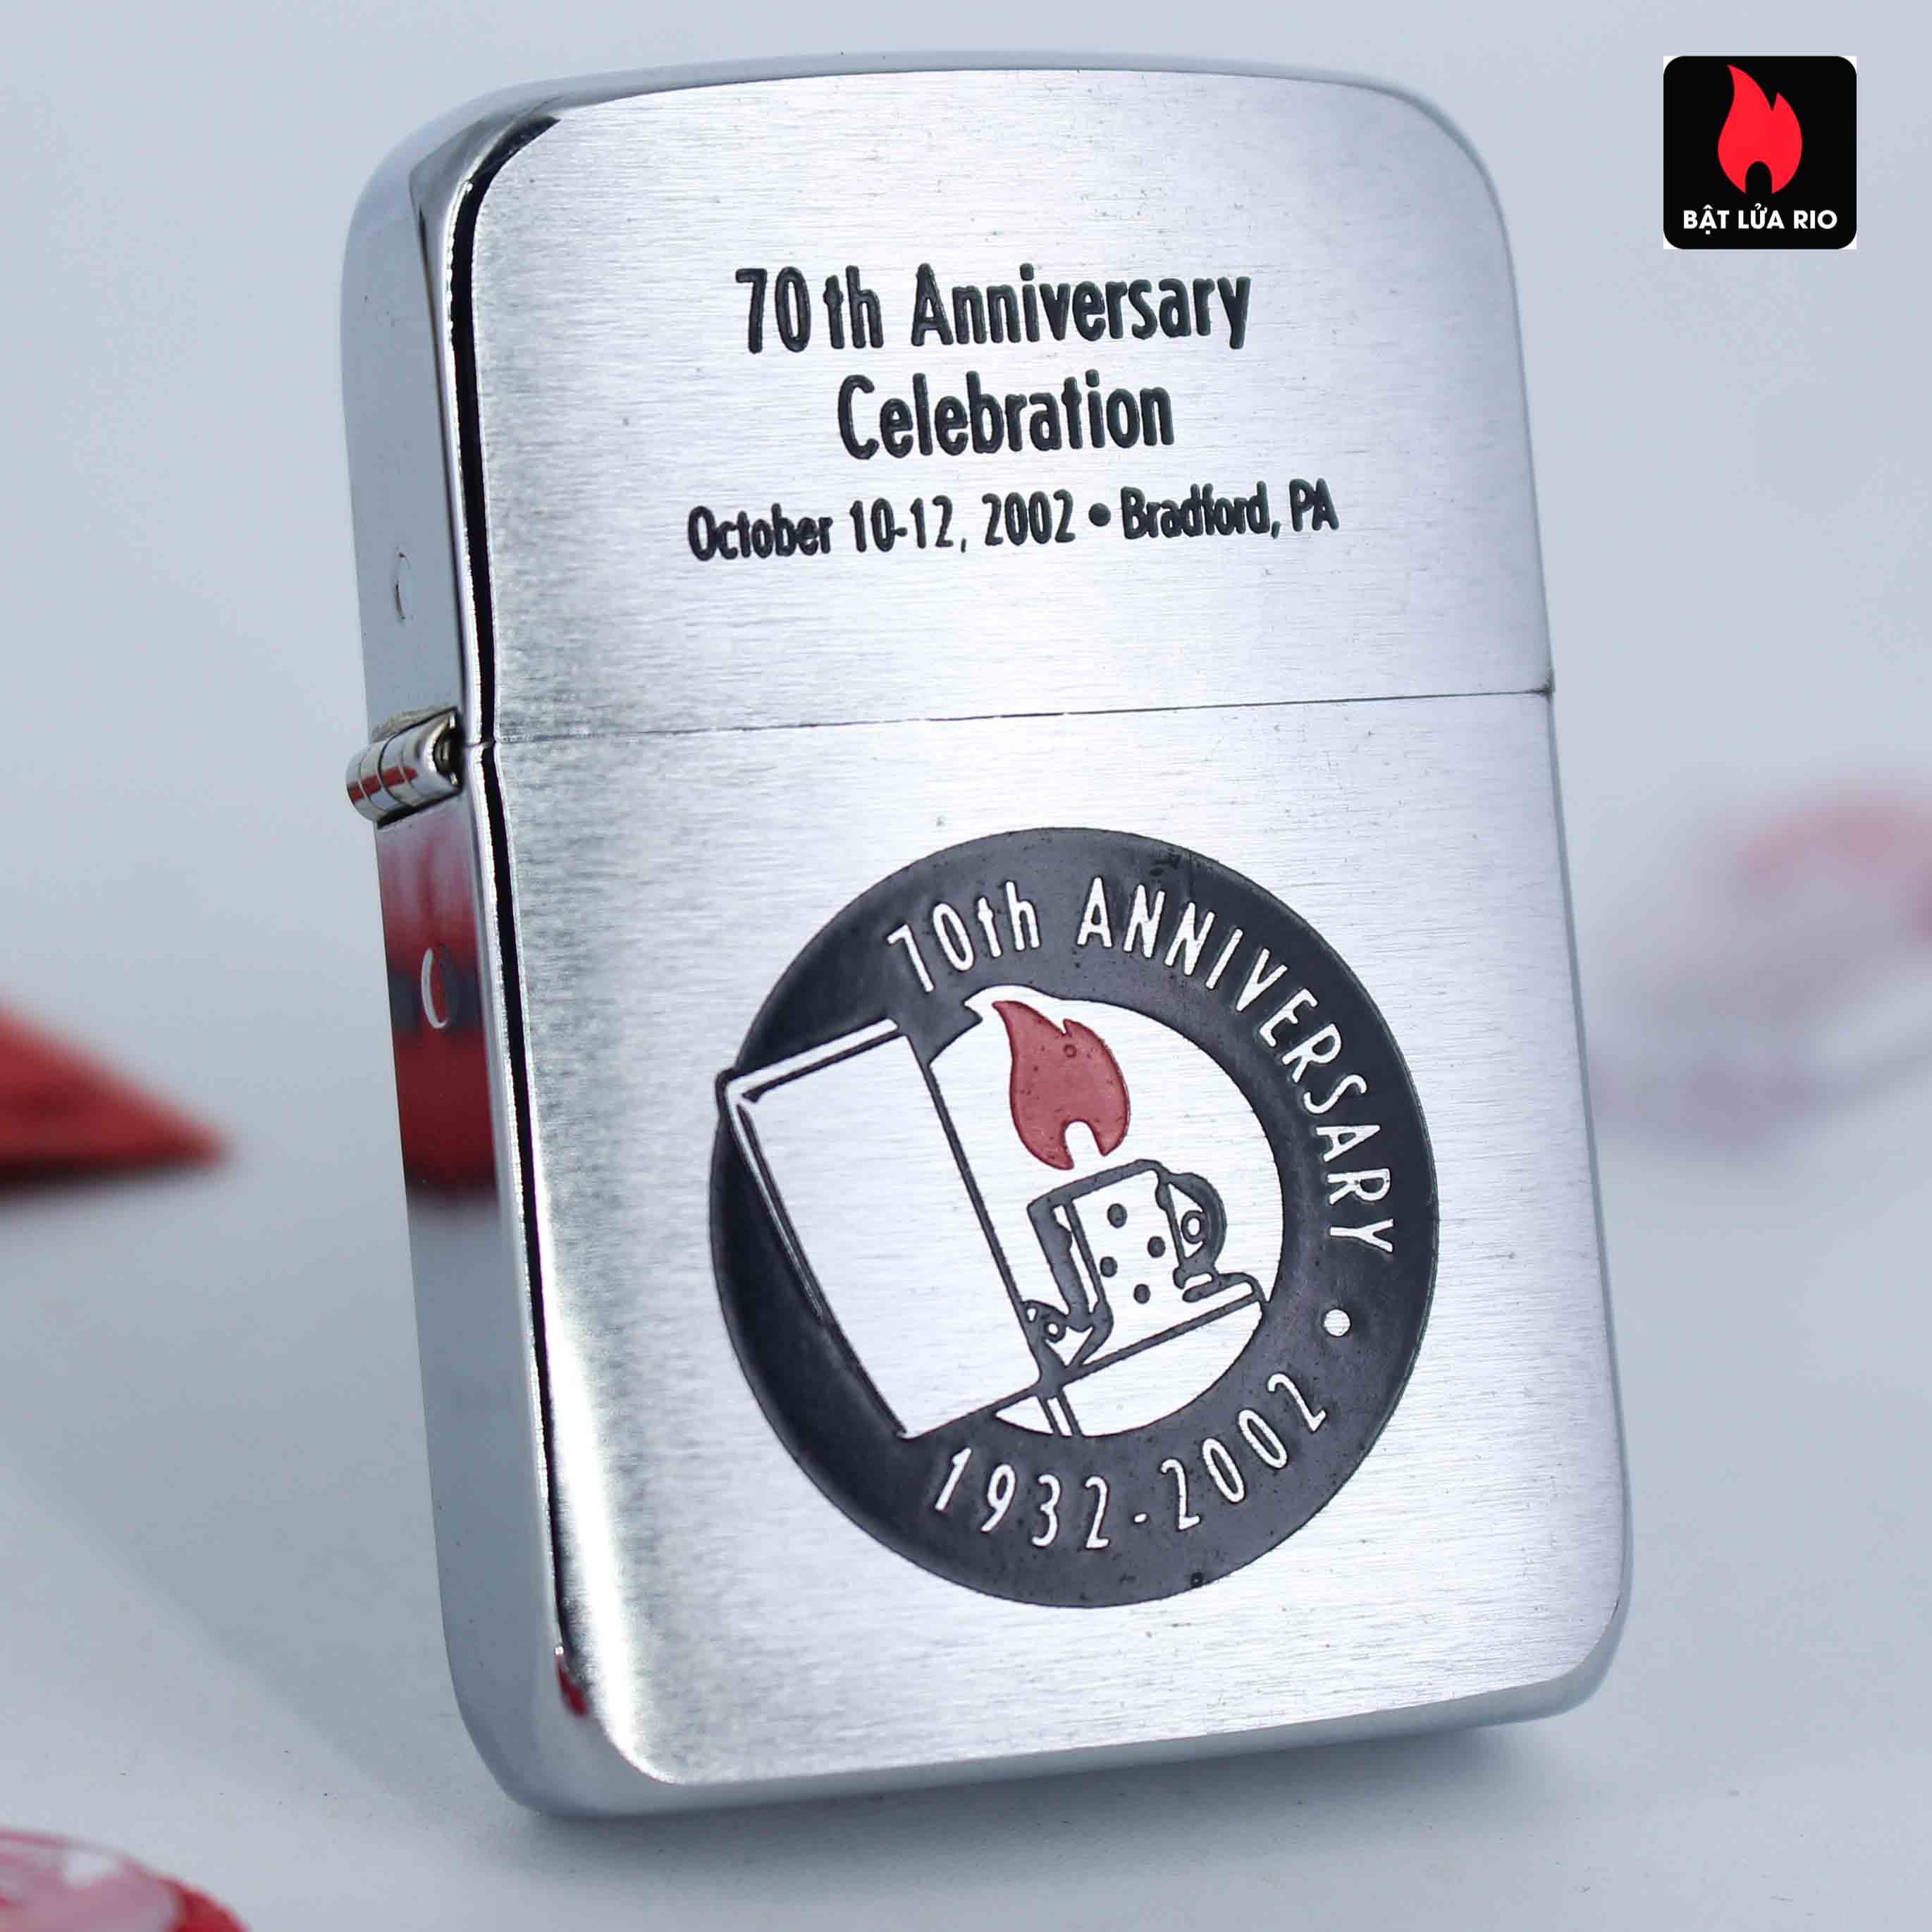 Zippo 2002 - 70th Anniversary Celebration